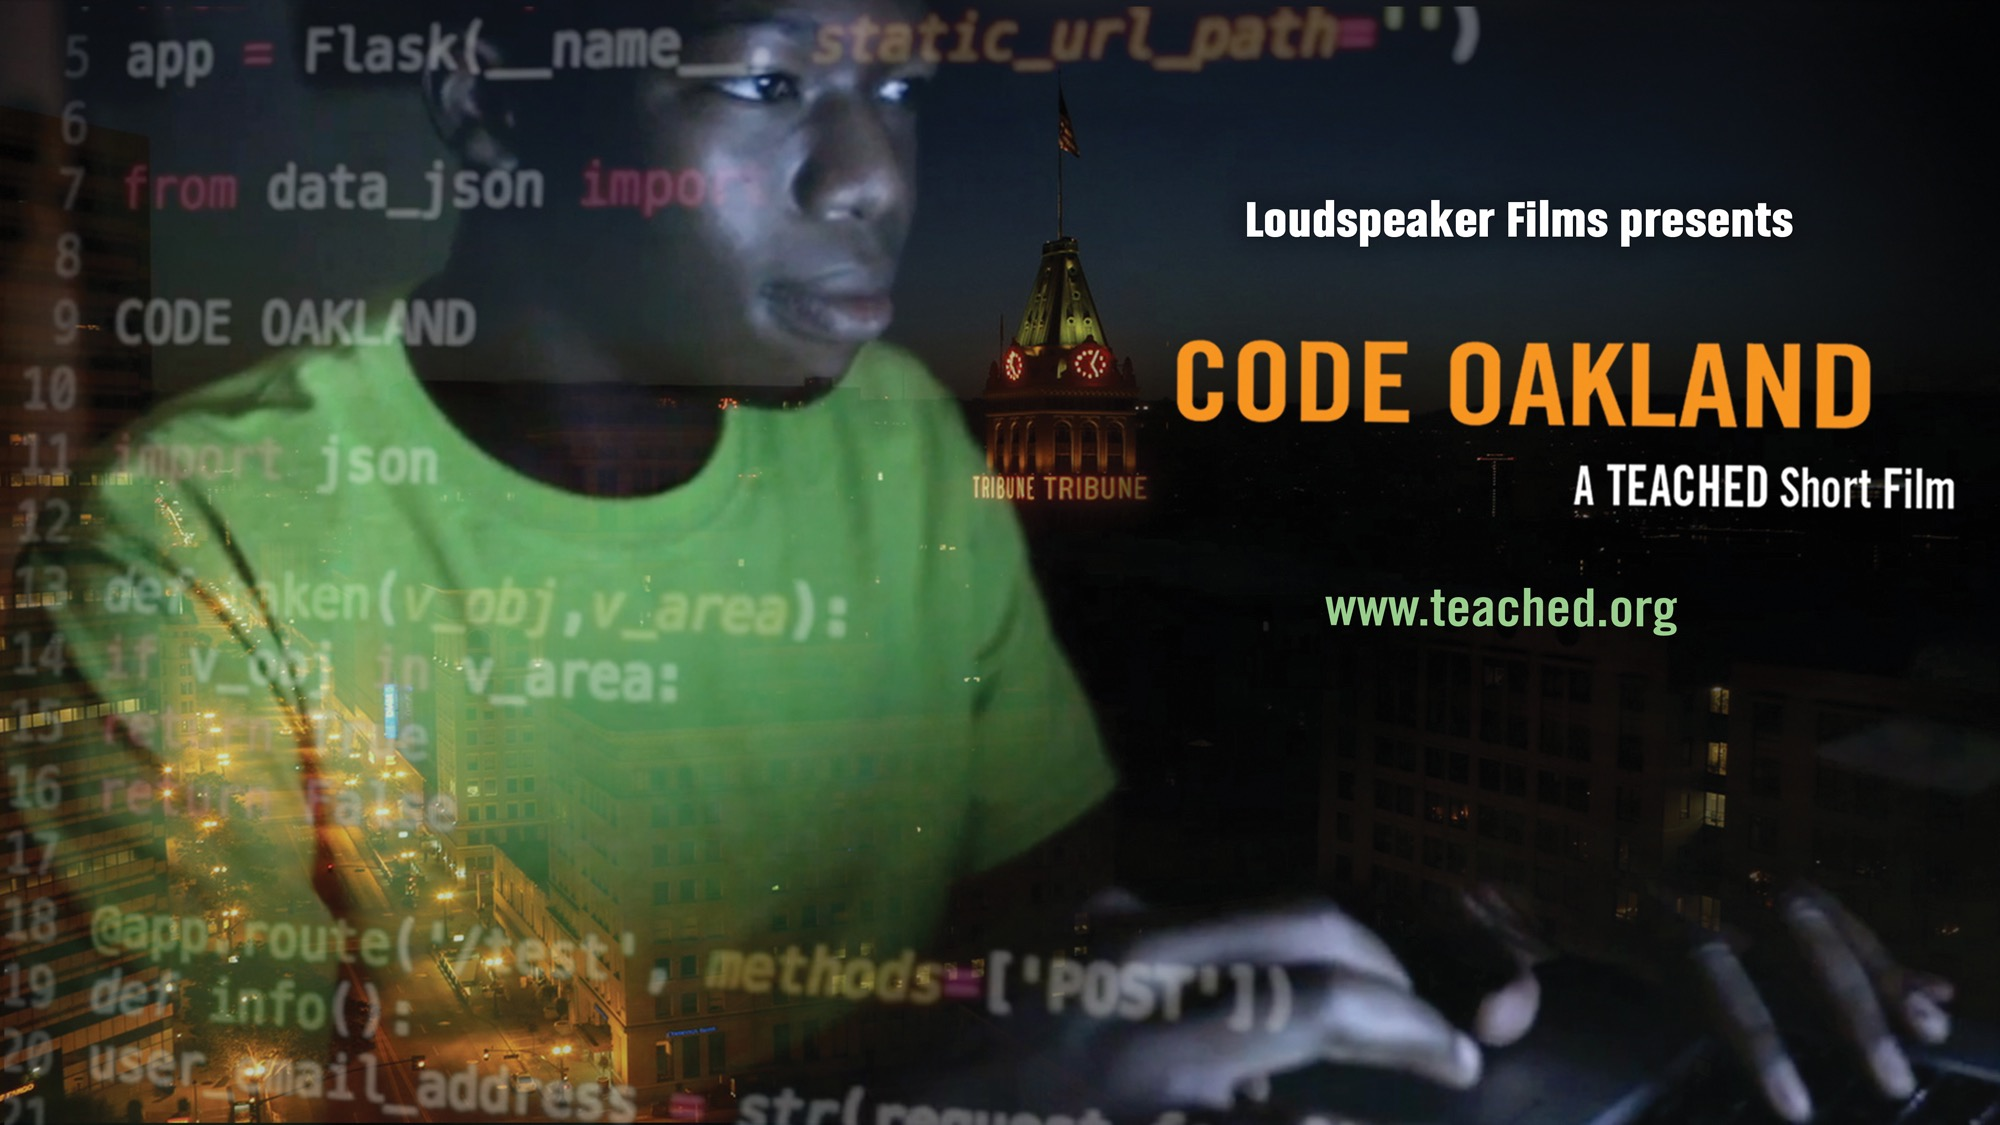 Code Oakland